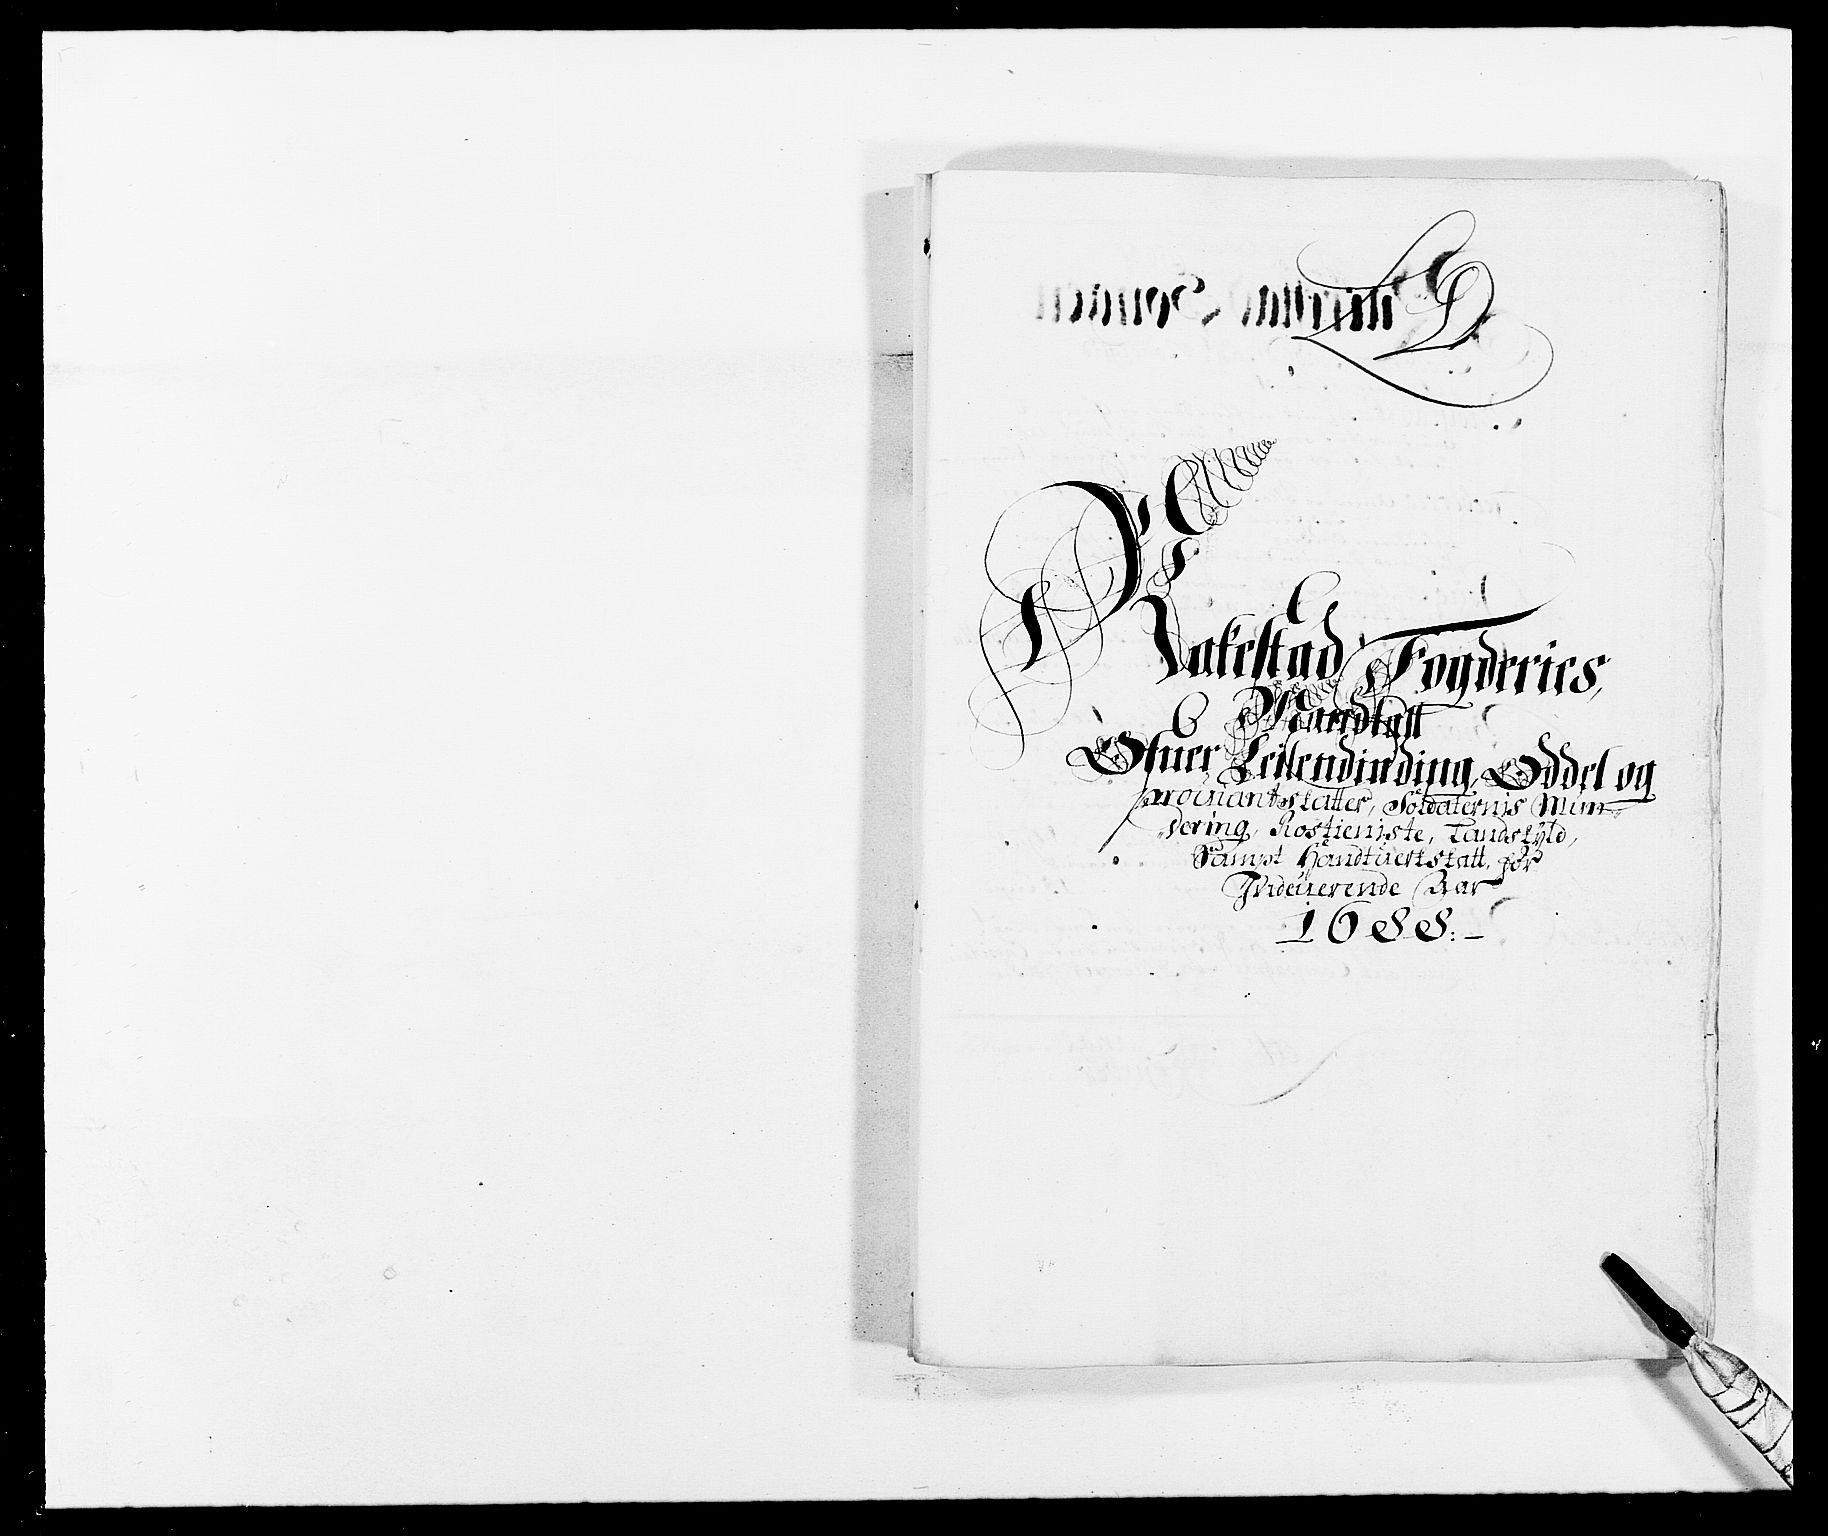 RA, Rentekammeret inntil 1814, Reviderte regnskaper, Fogderegnskap, R05/L0276: Fogderegnskap Rakkestad, 1683-1688, s. 143